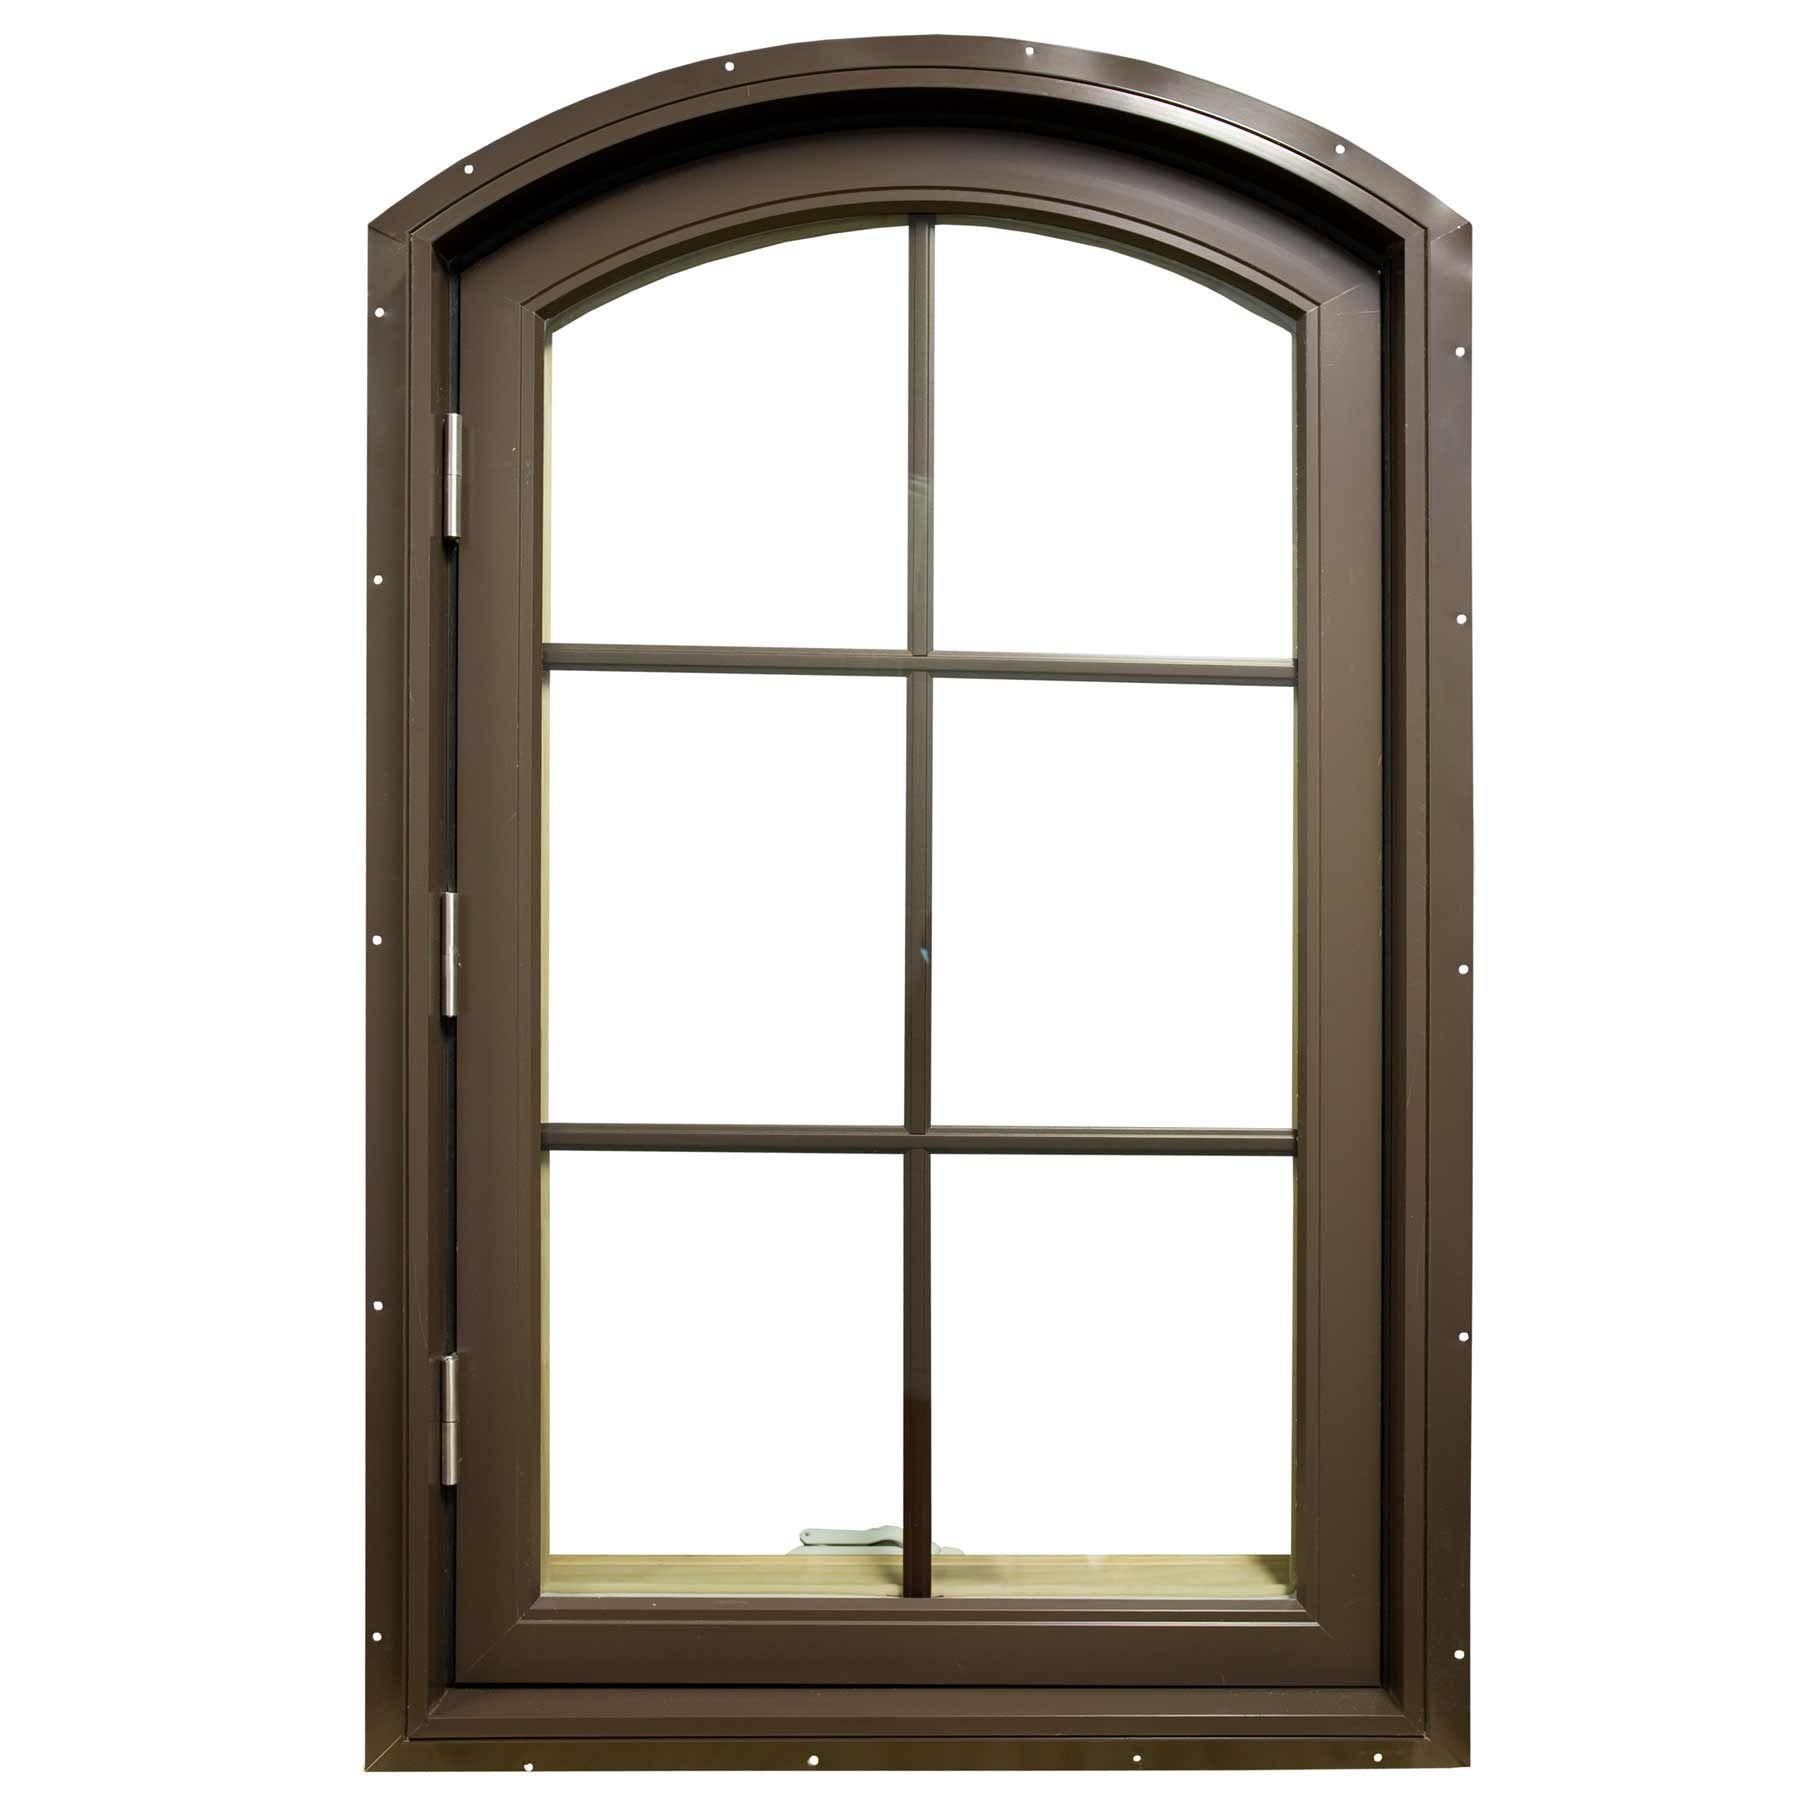 Aluminum casement windows for home feel the home